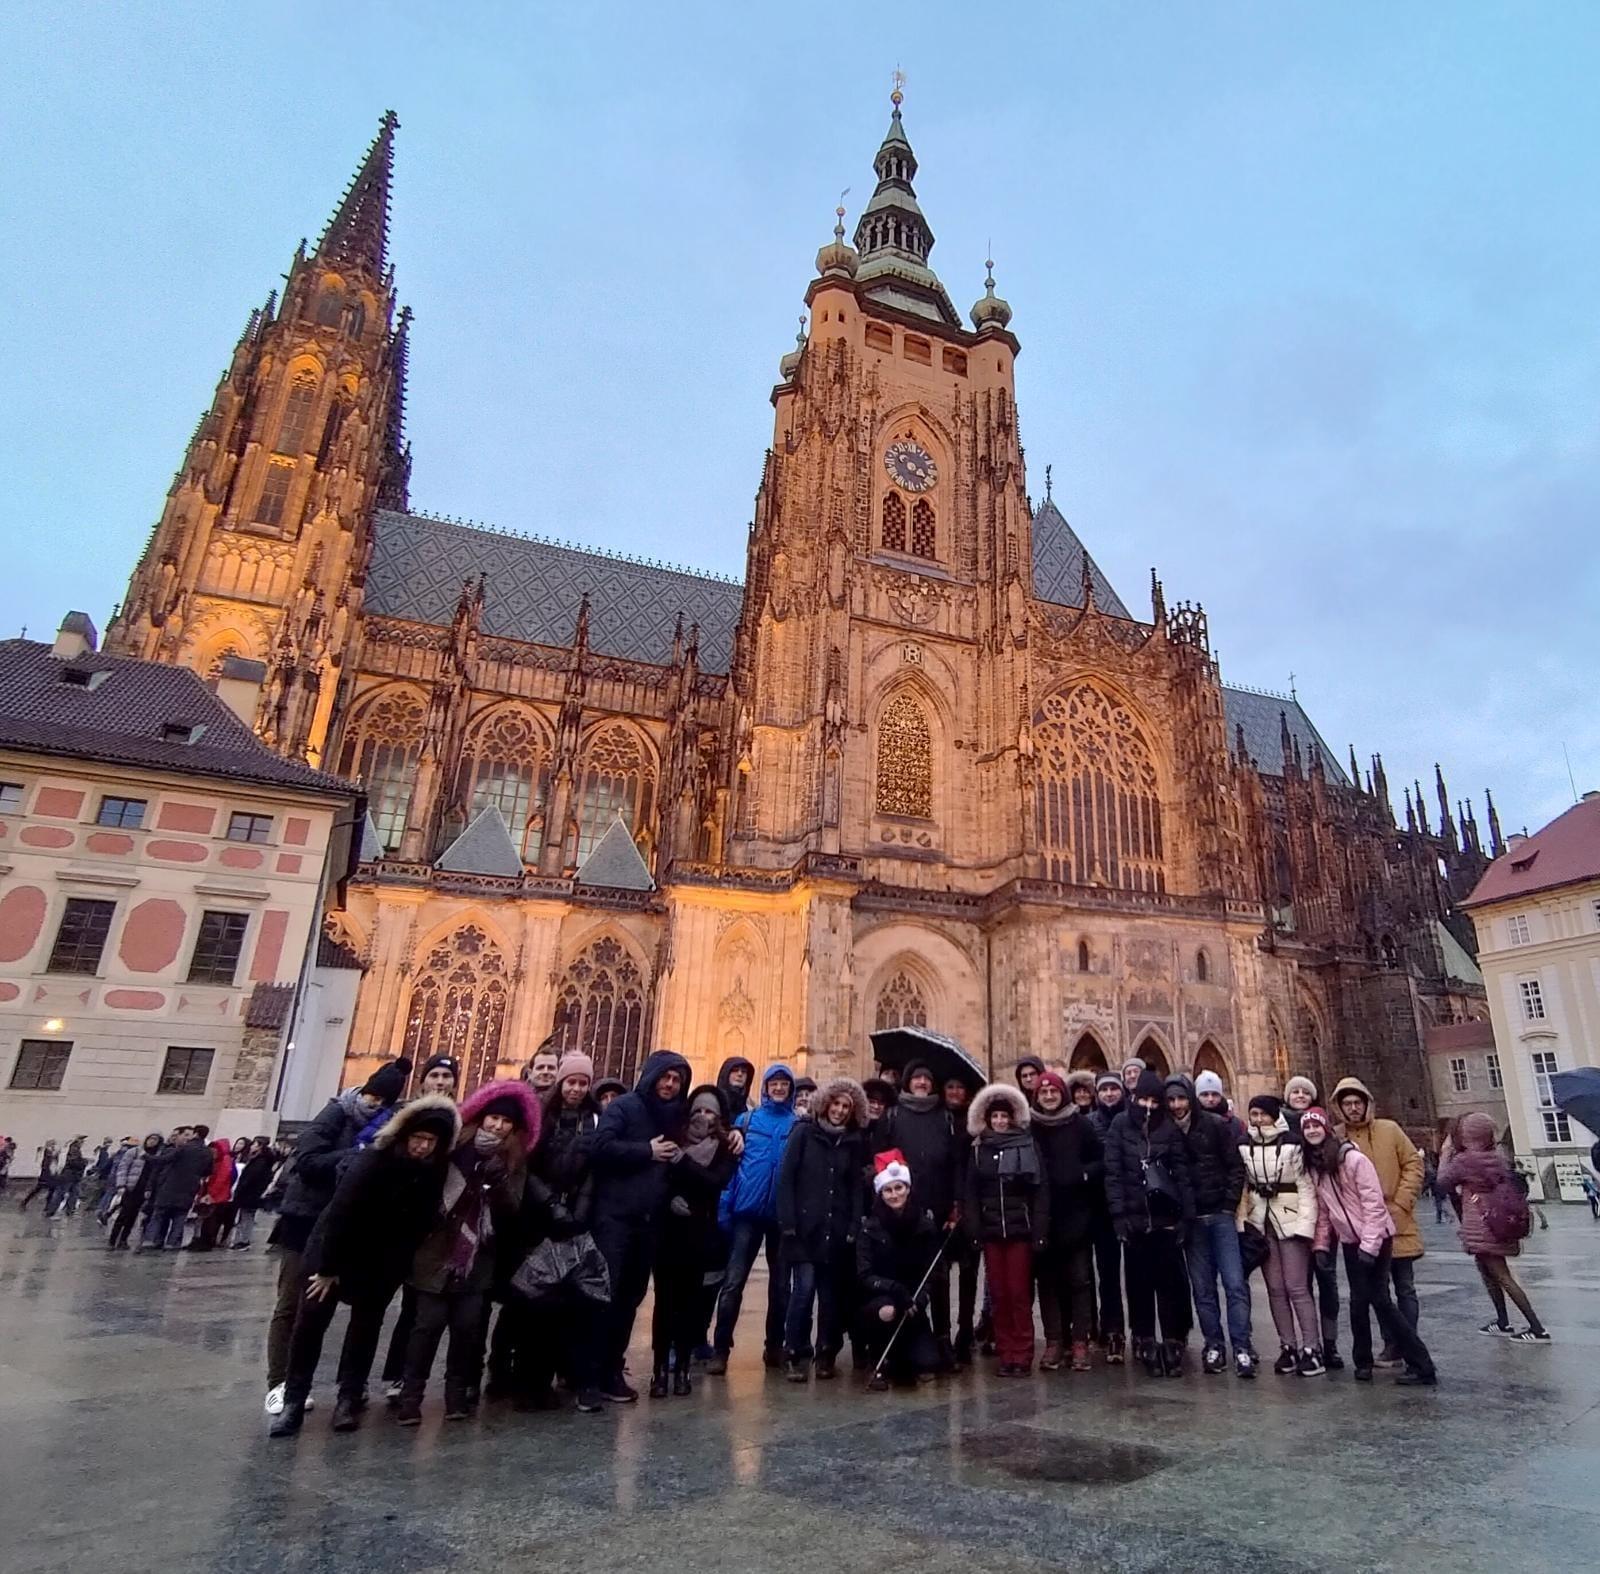 prague-castle-and-mala-strana-district-tour-16